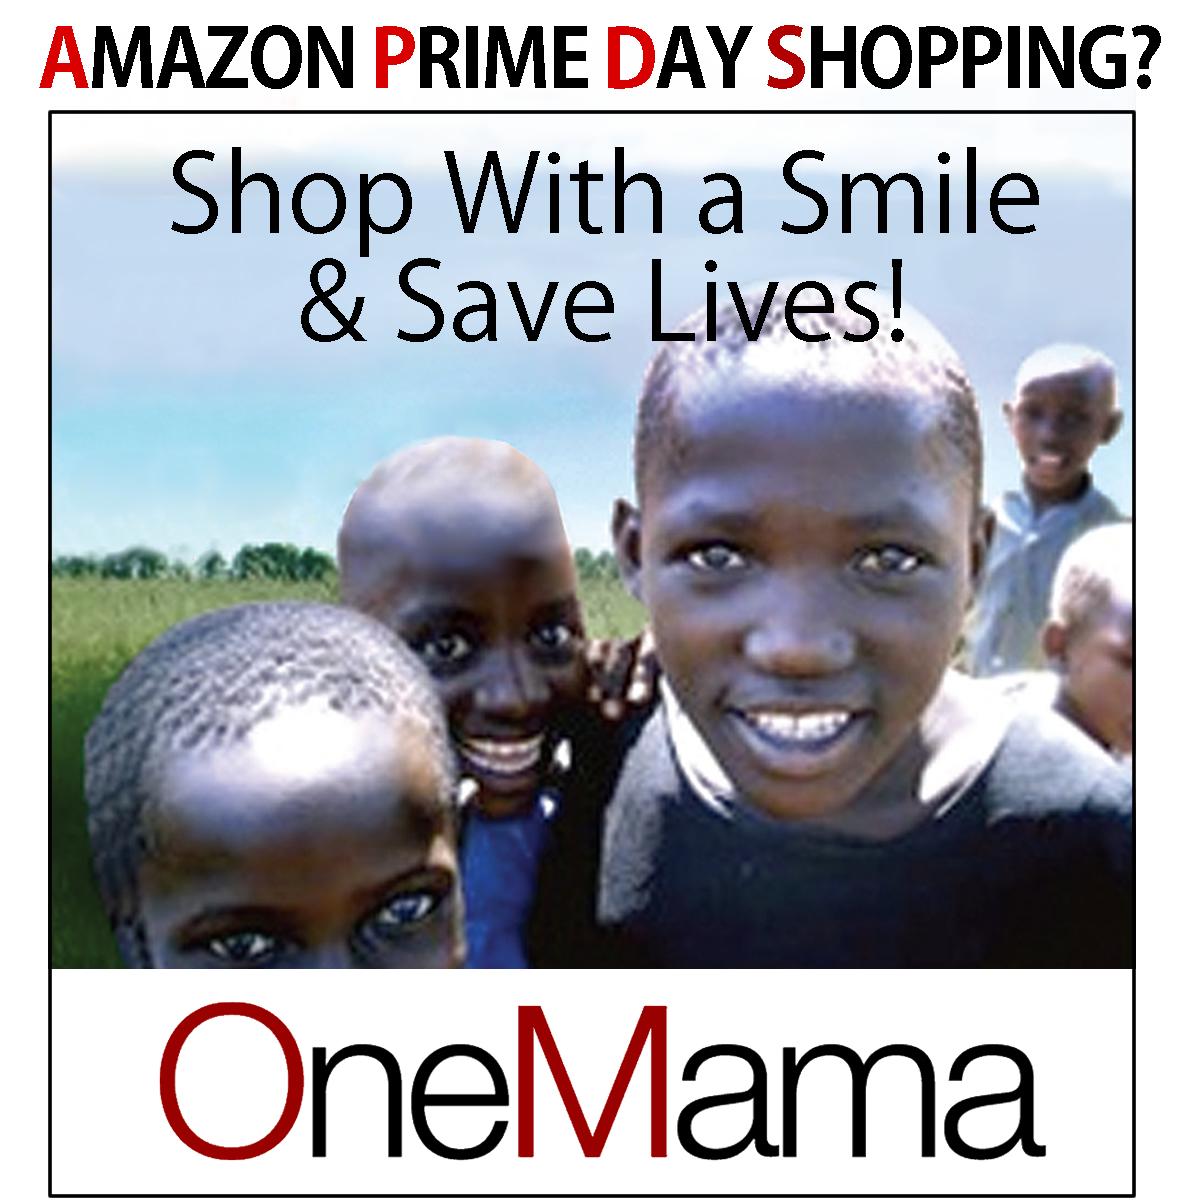 AmazonPrimeDay-Ad-OneMama